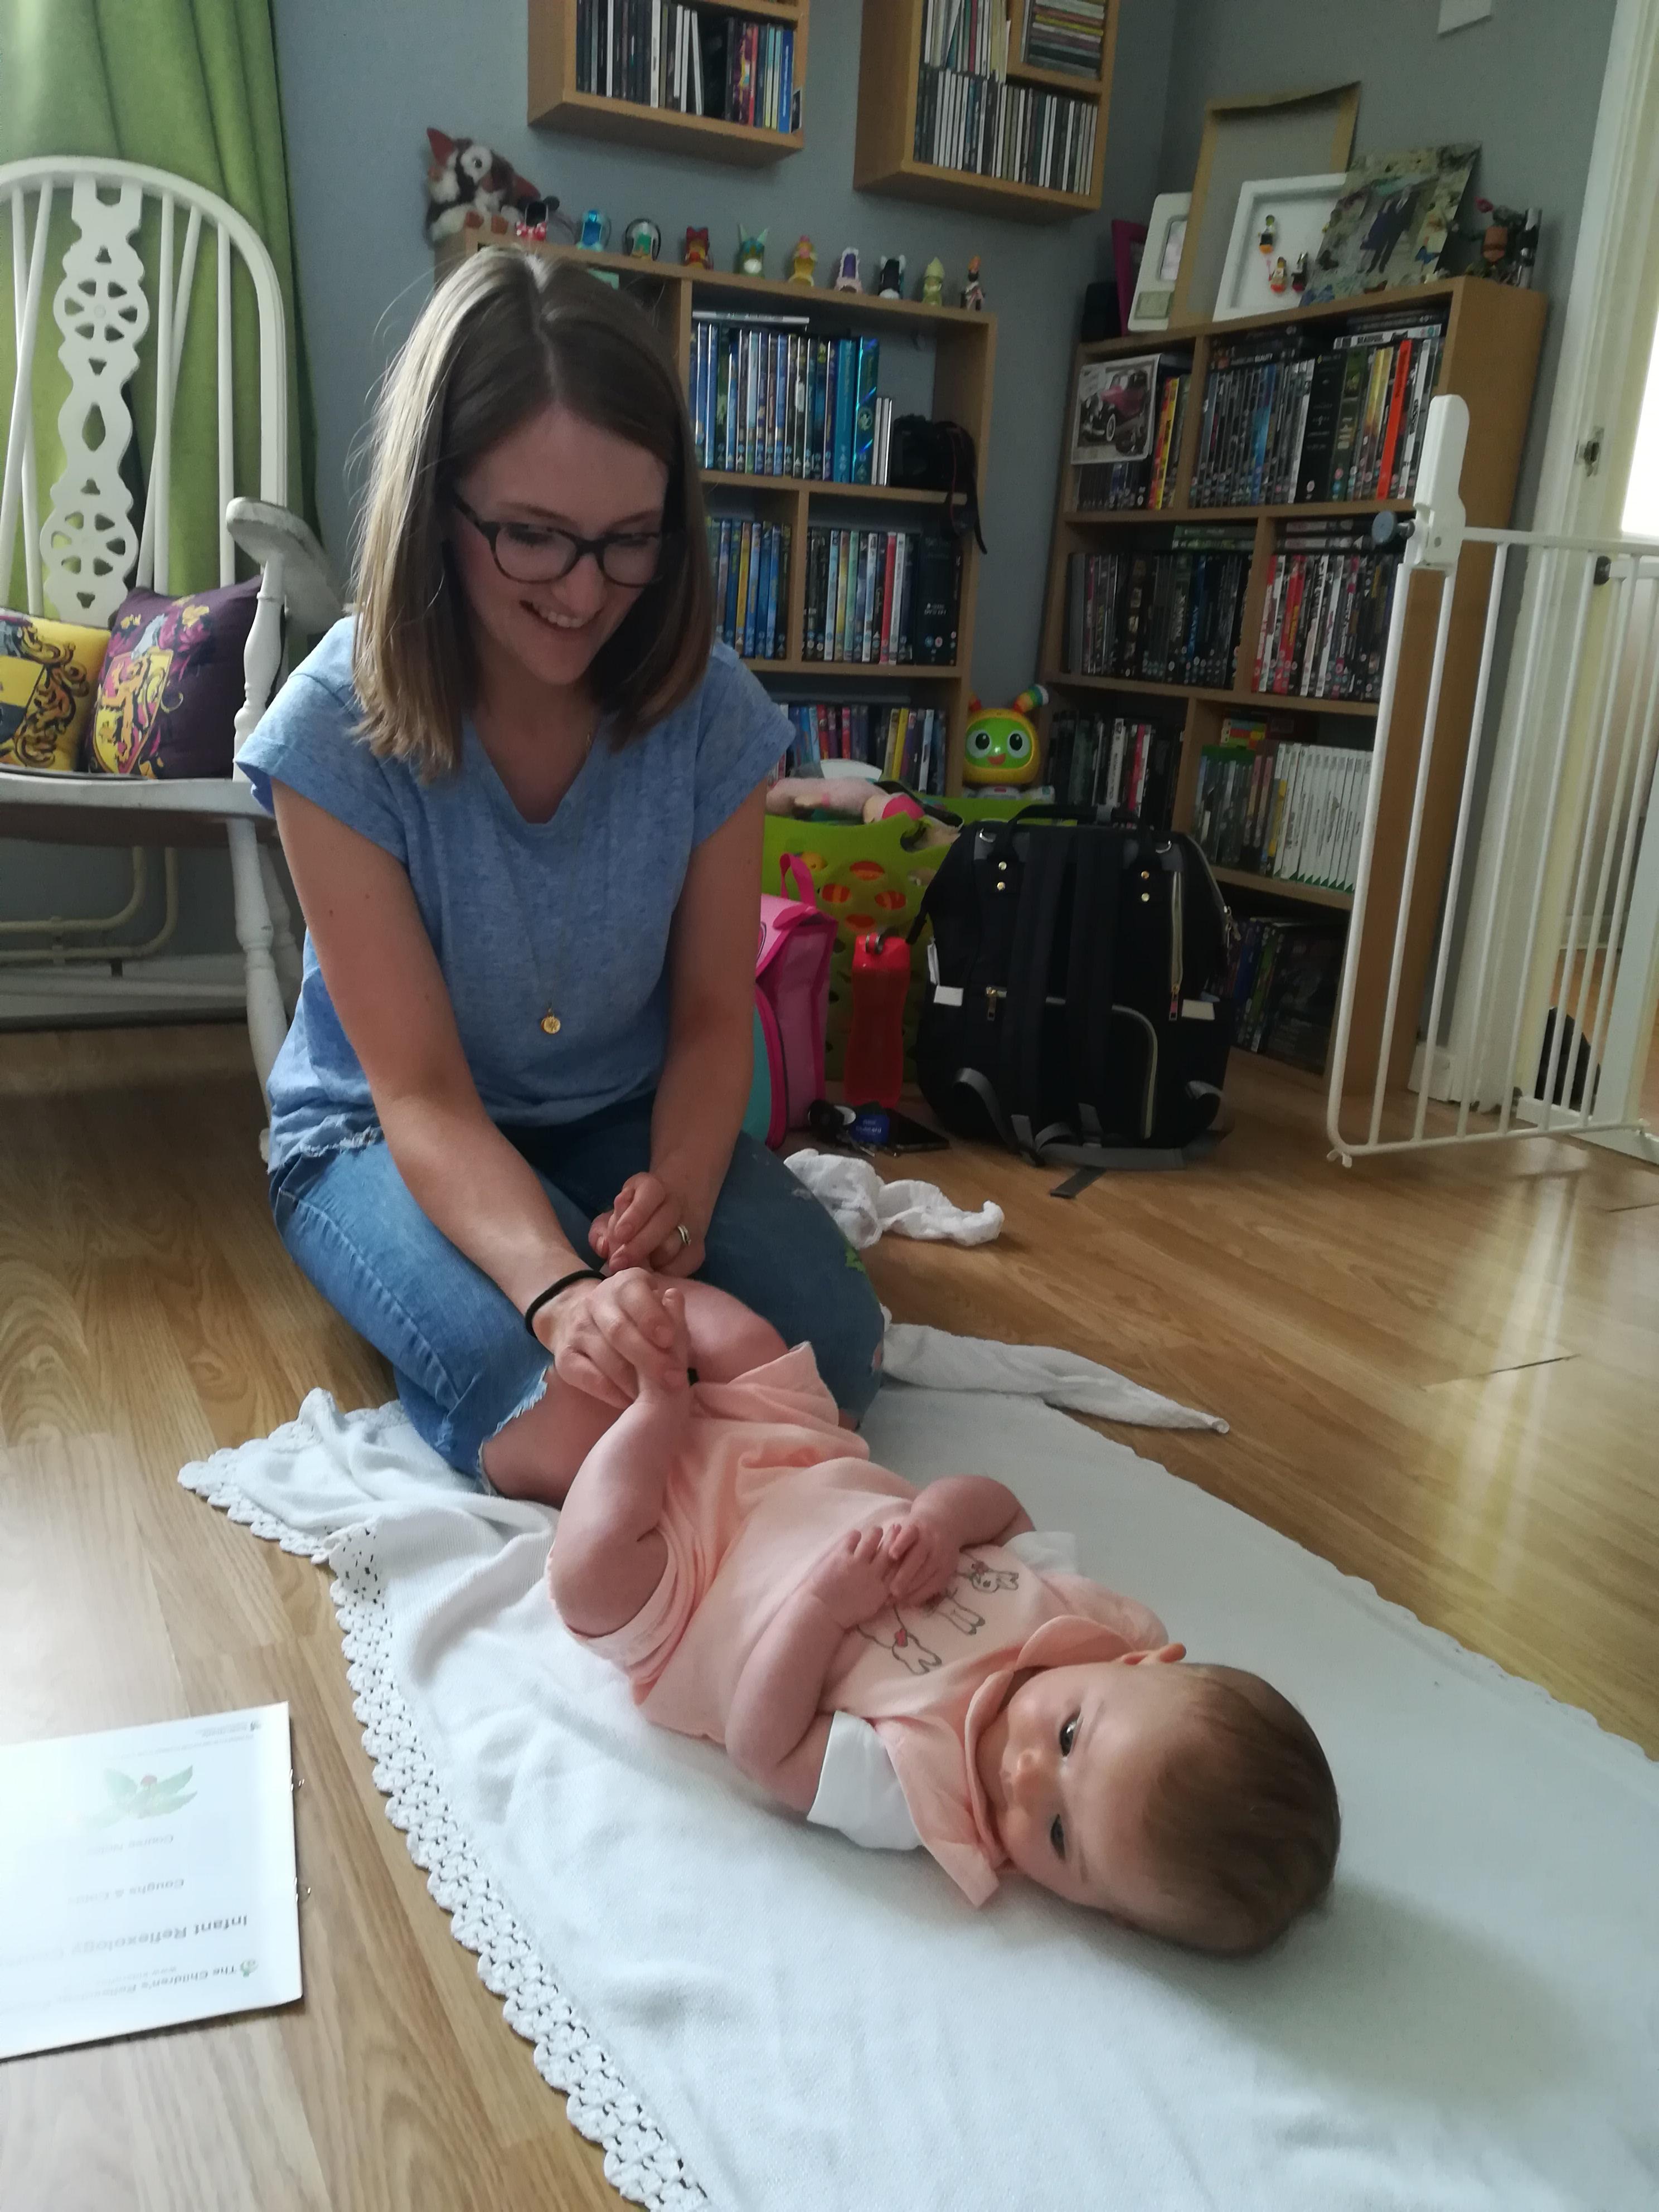 baby reflexology